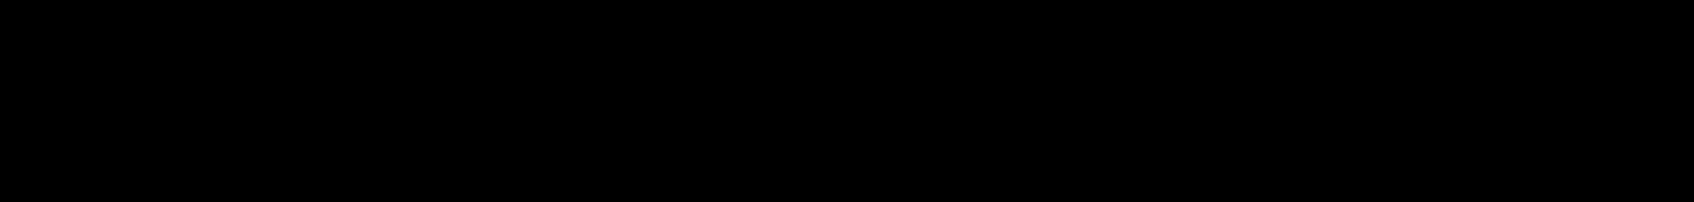 Cavole Slab Regular Italic